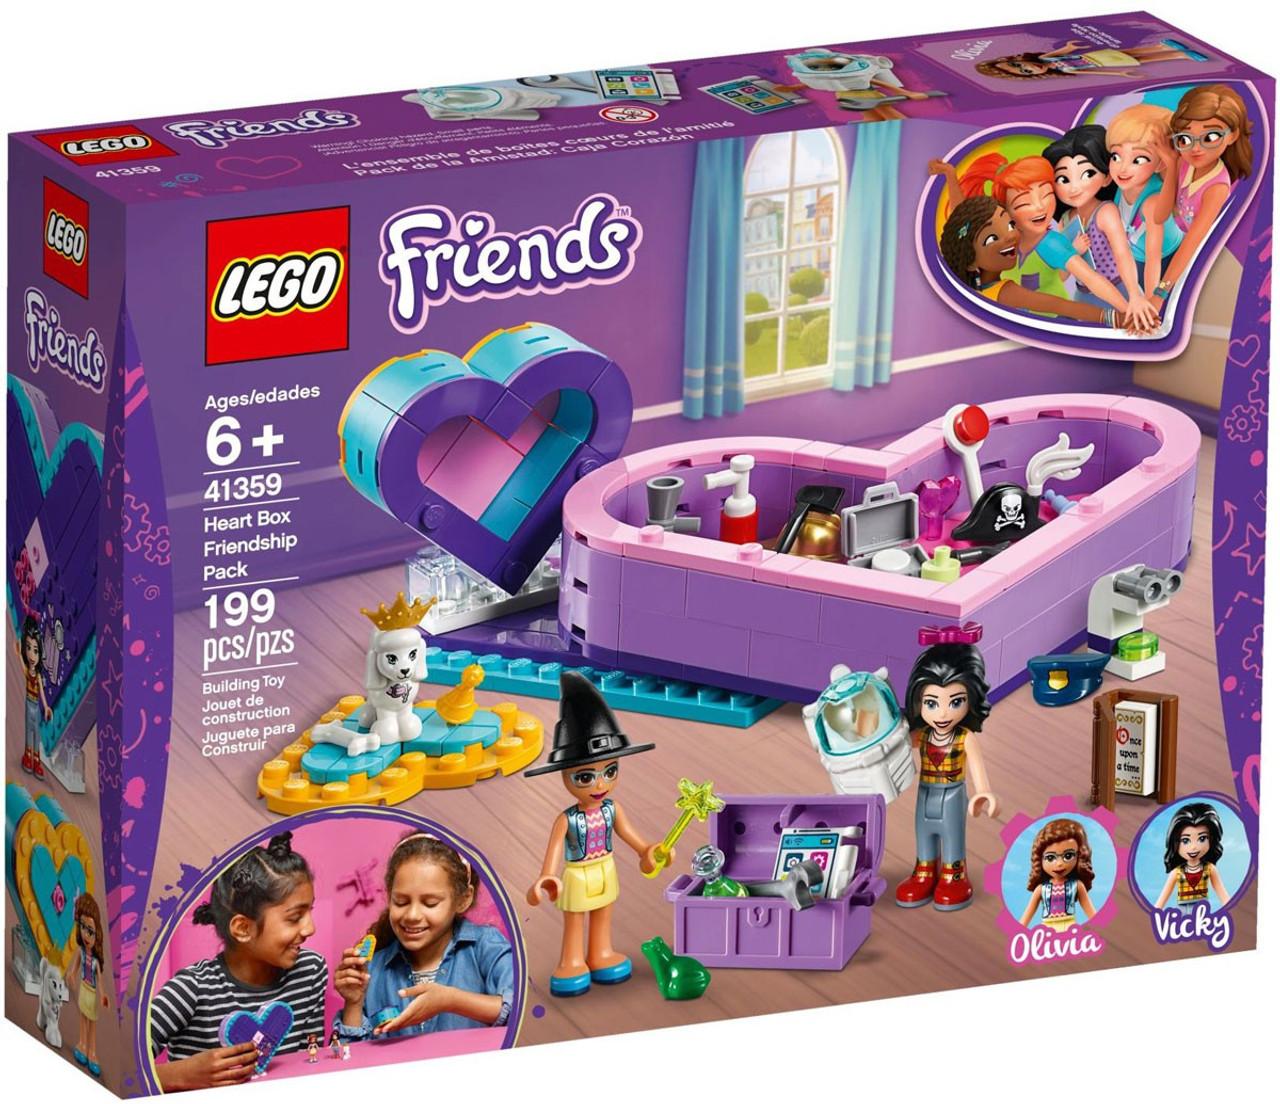 Lego Friends Heart Box Friendship Pack Set 41359 Toywiz